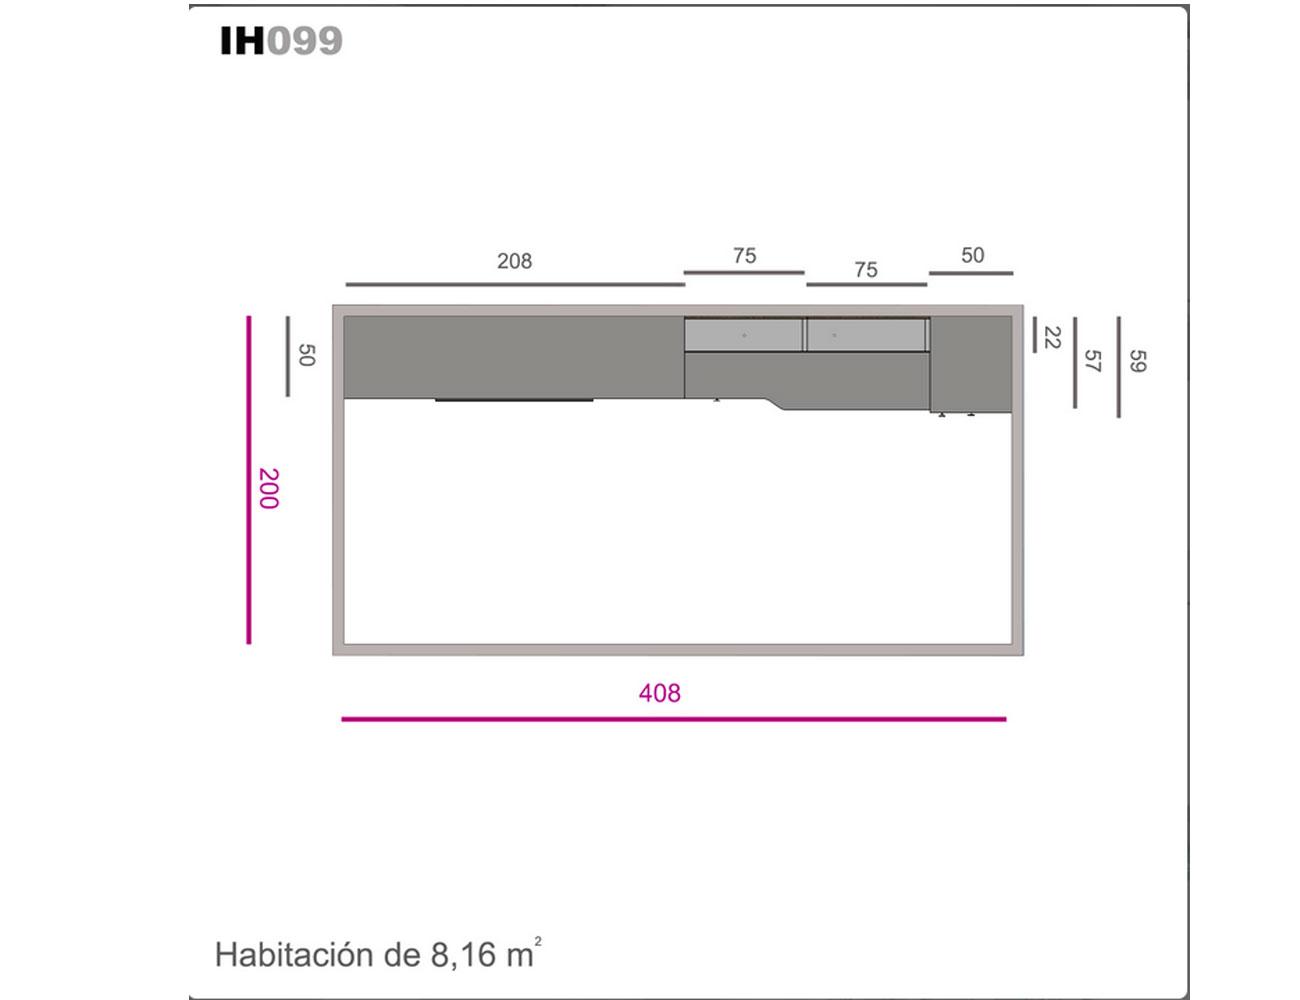 Ih099 medidas